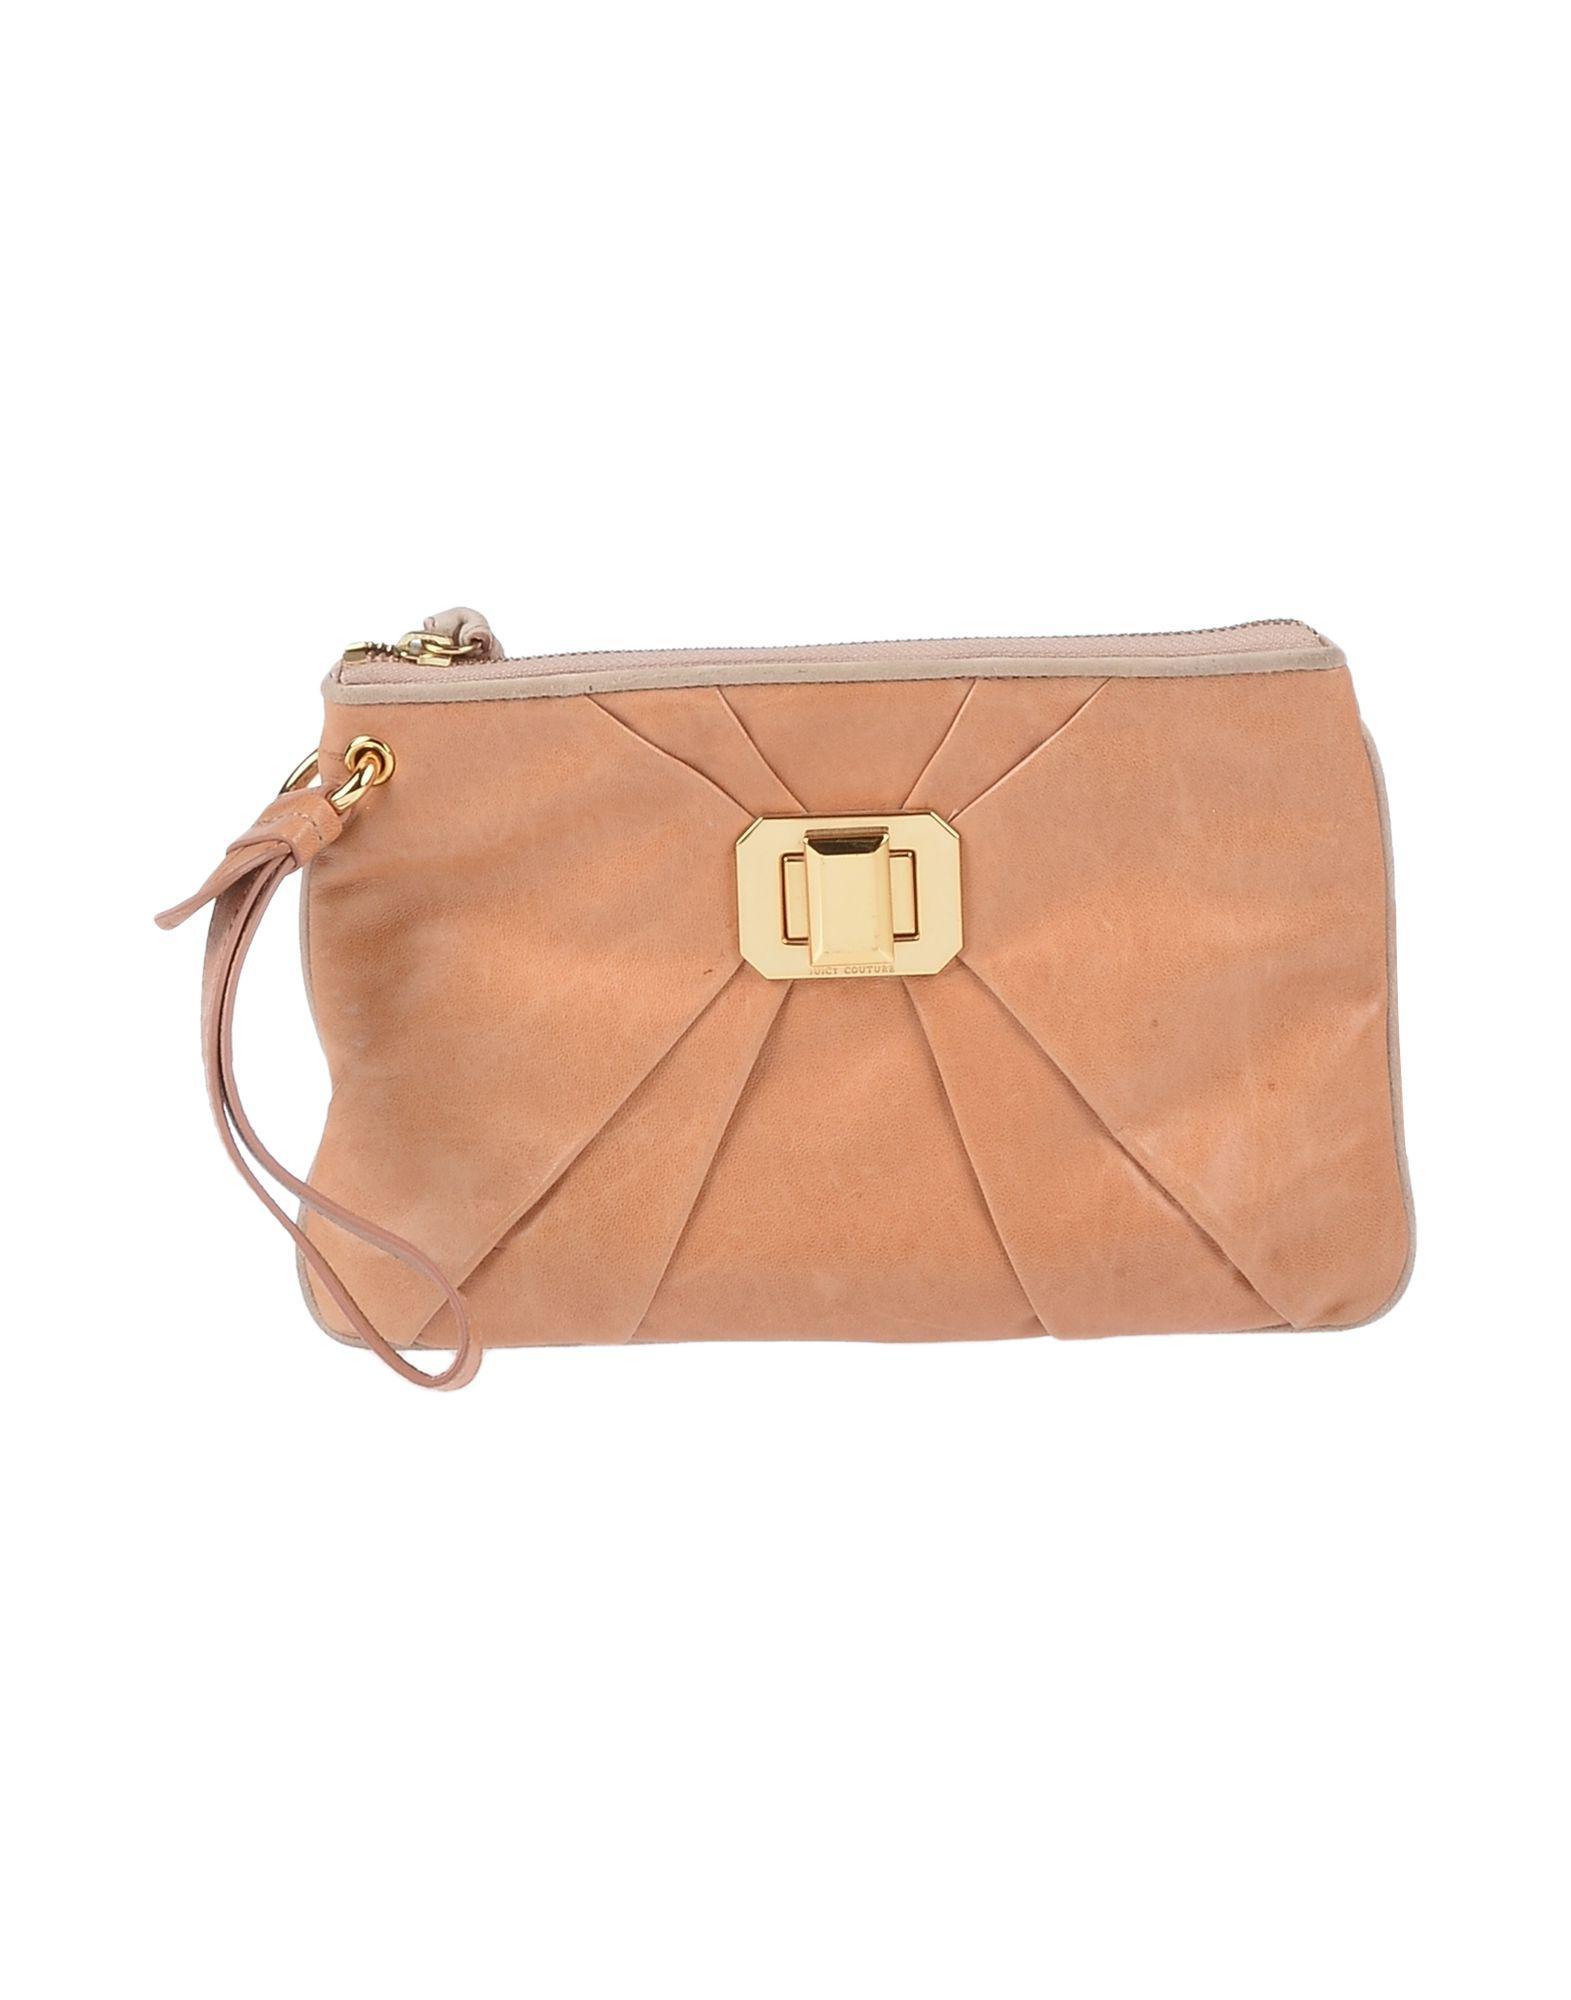 Juicy Couture Handbag in Natural - Lyst e7e47404d5